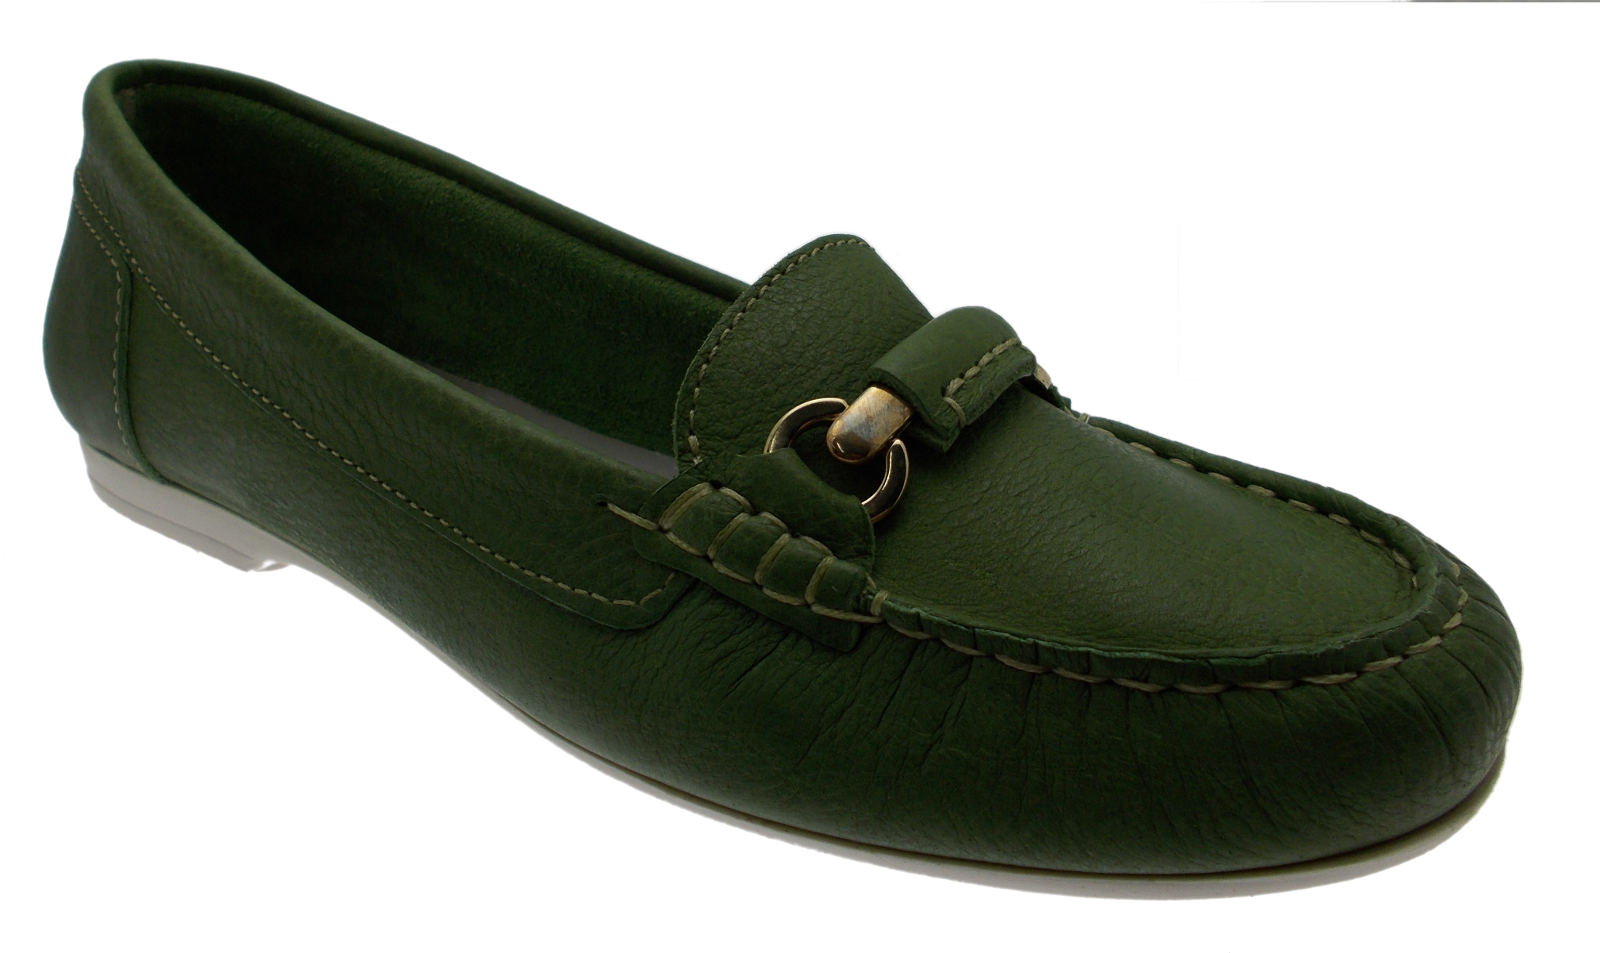 Mocassino Mocassino Mocassino pelle verde morsetto art 442 Calzaturificio R.P  entrega de rayos